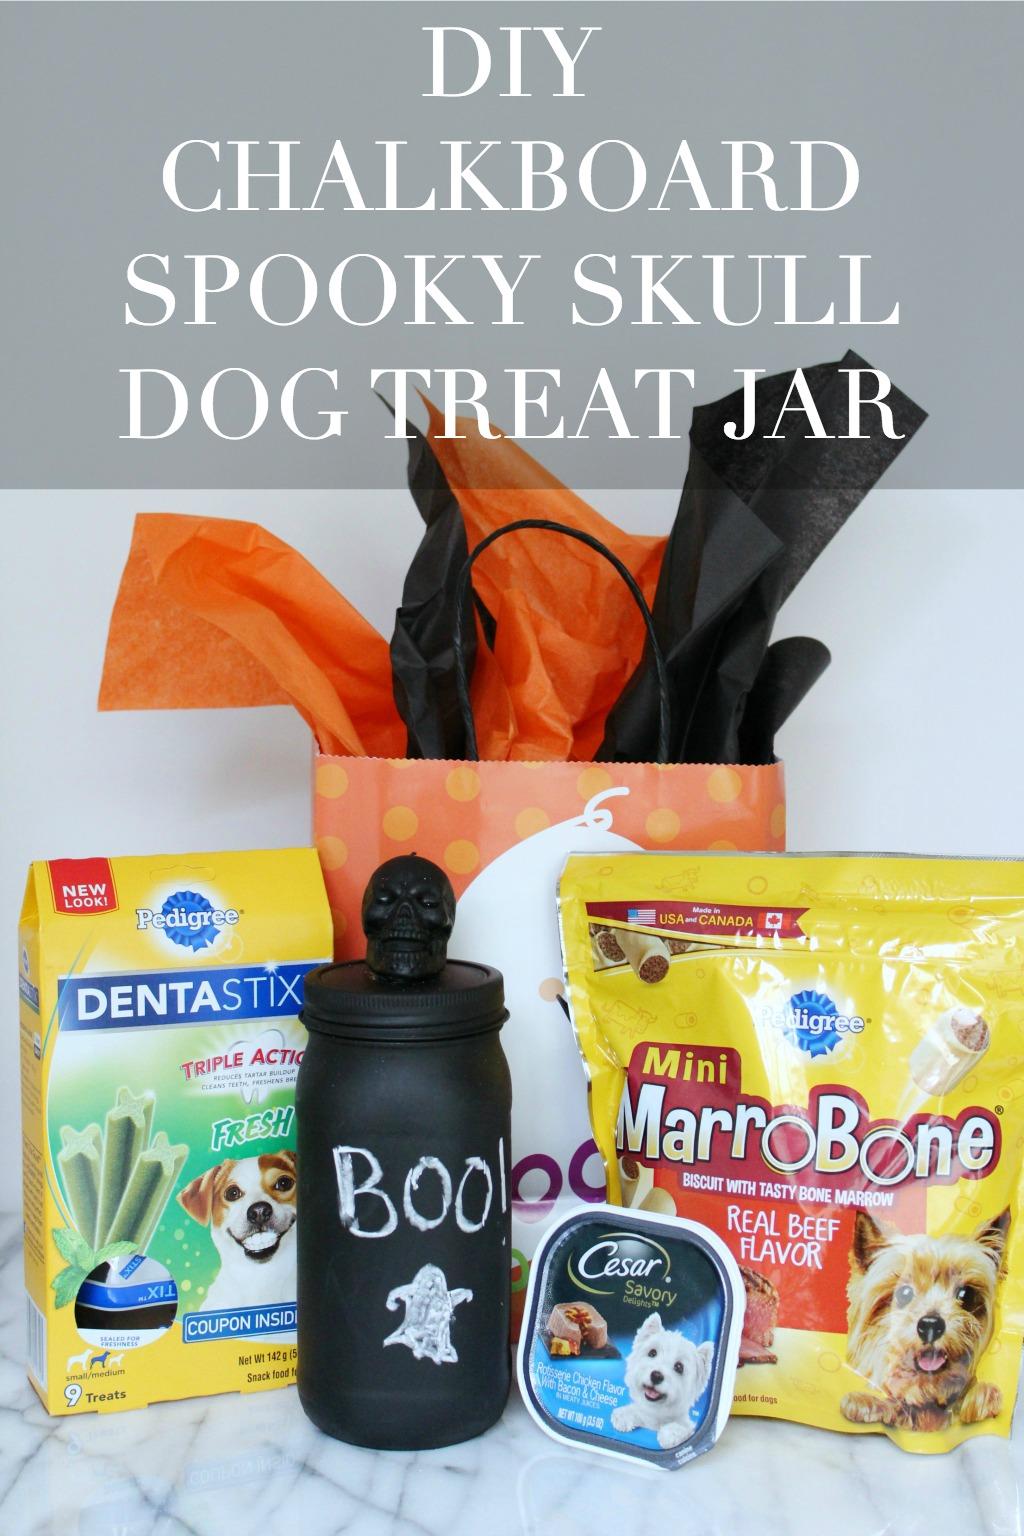 DIY Chalkboard Skull Dog Treat Jar